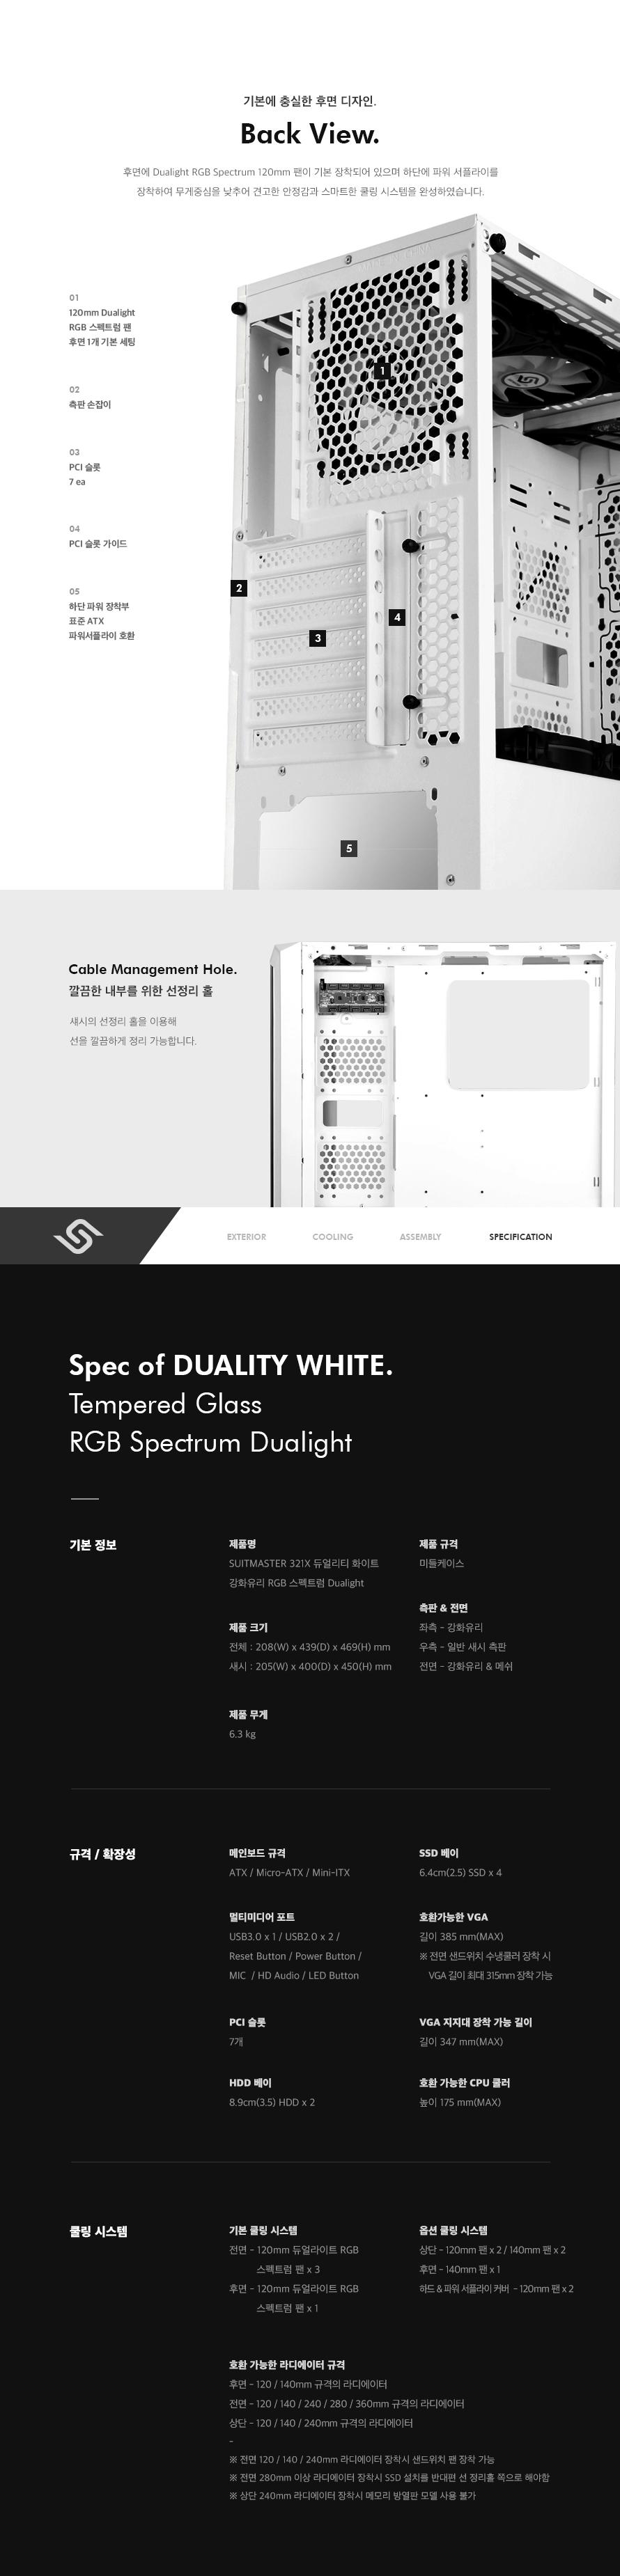 ABKO SUITMASTER 321X 듀얼리티 강화유리 스펙트럼 Dualight(화이트)